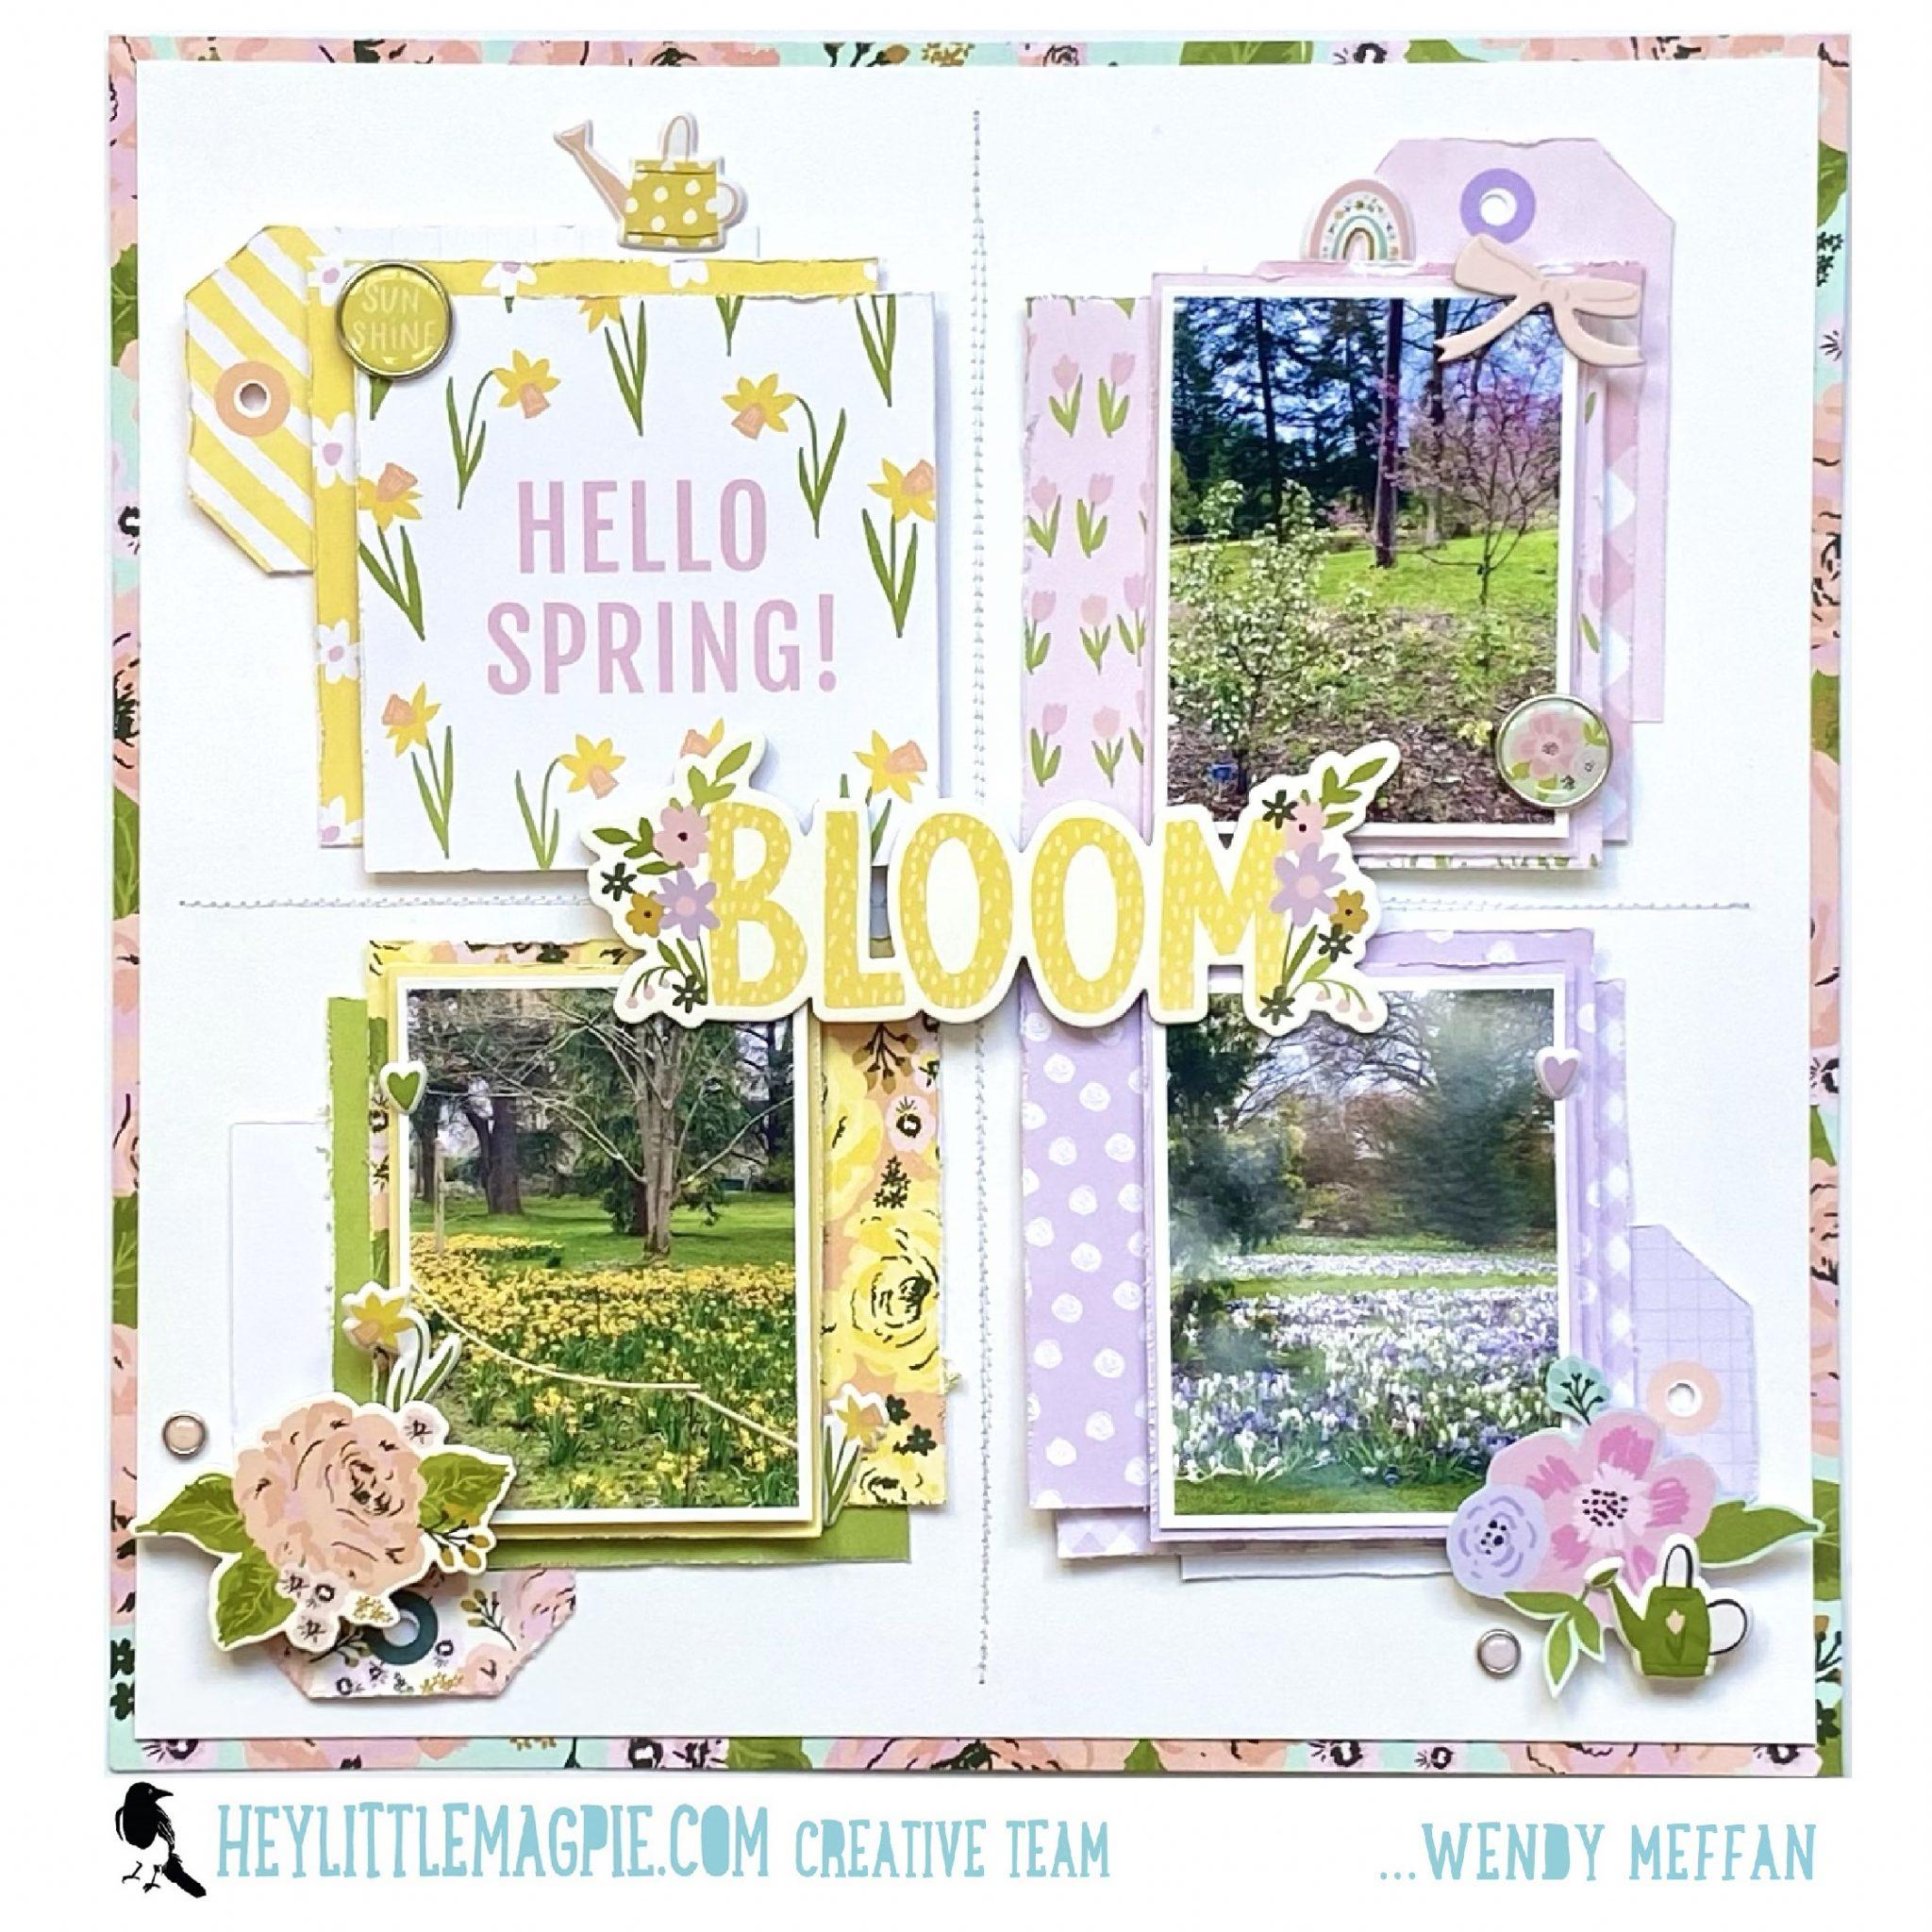 BLOOM! – Simple Stories – Bunnies and Blooms -Part 2 – Wendy Meffan